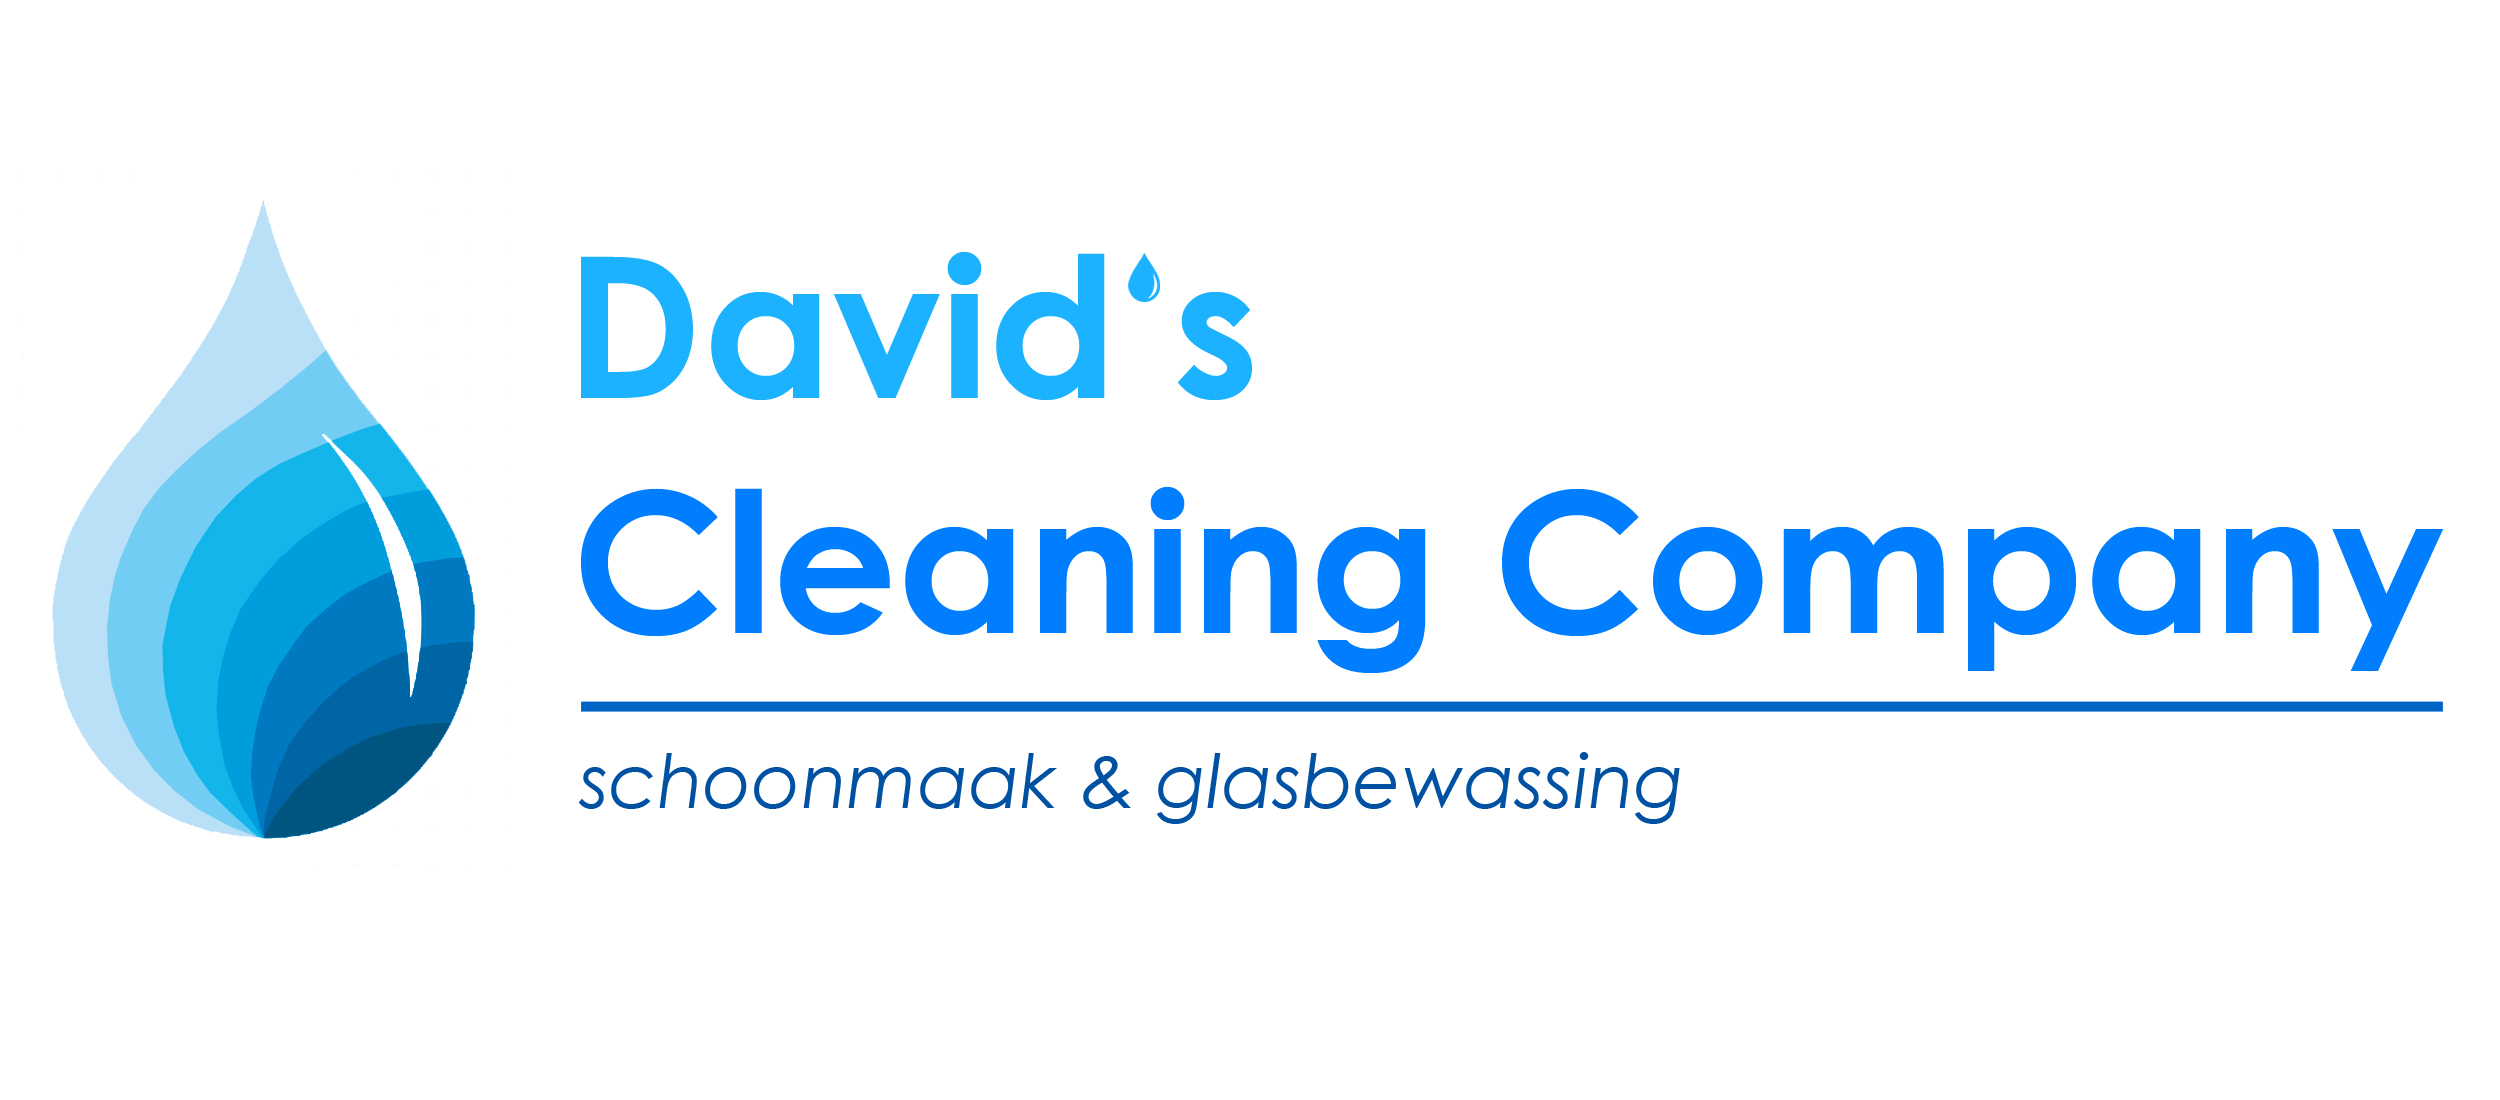 David's cleaning company